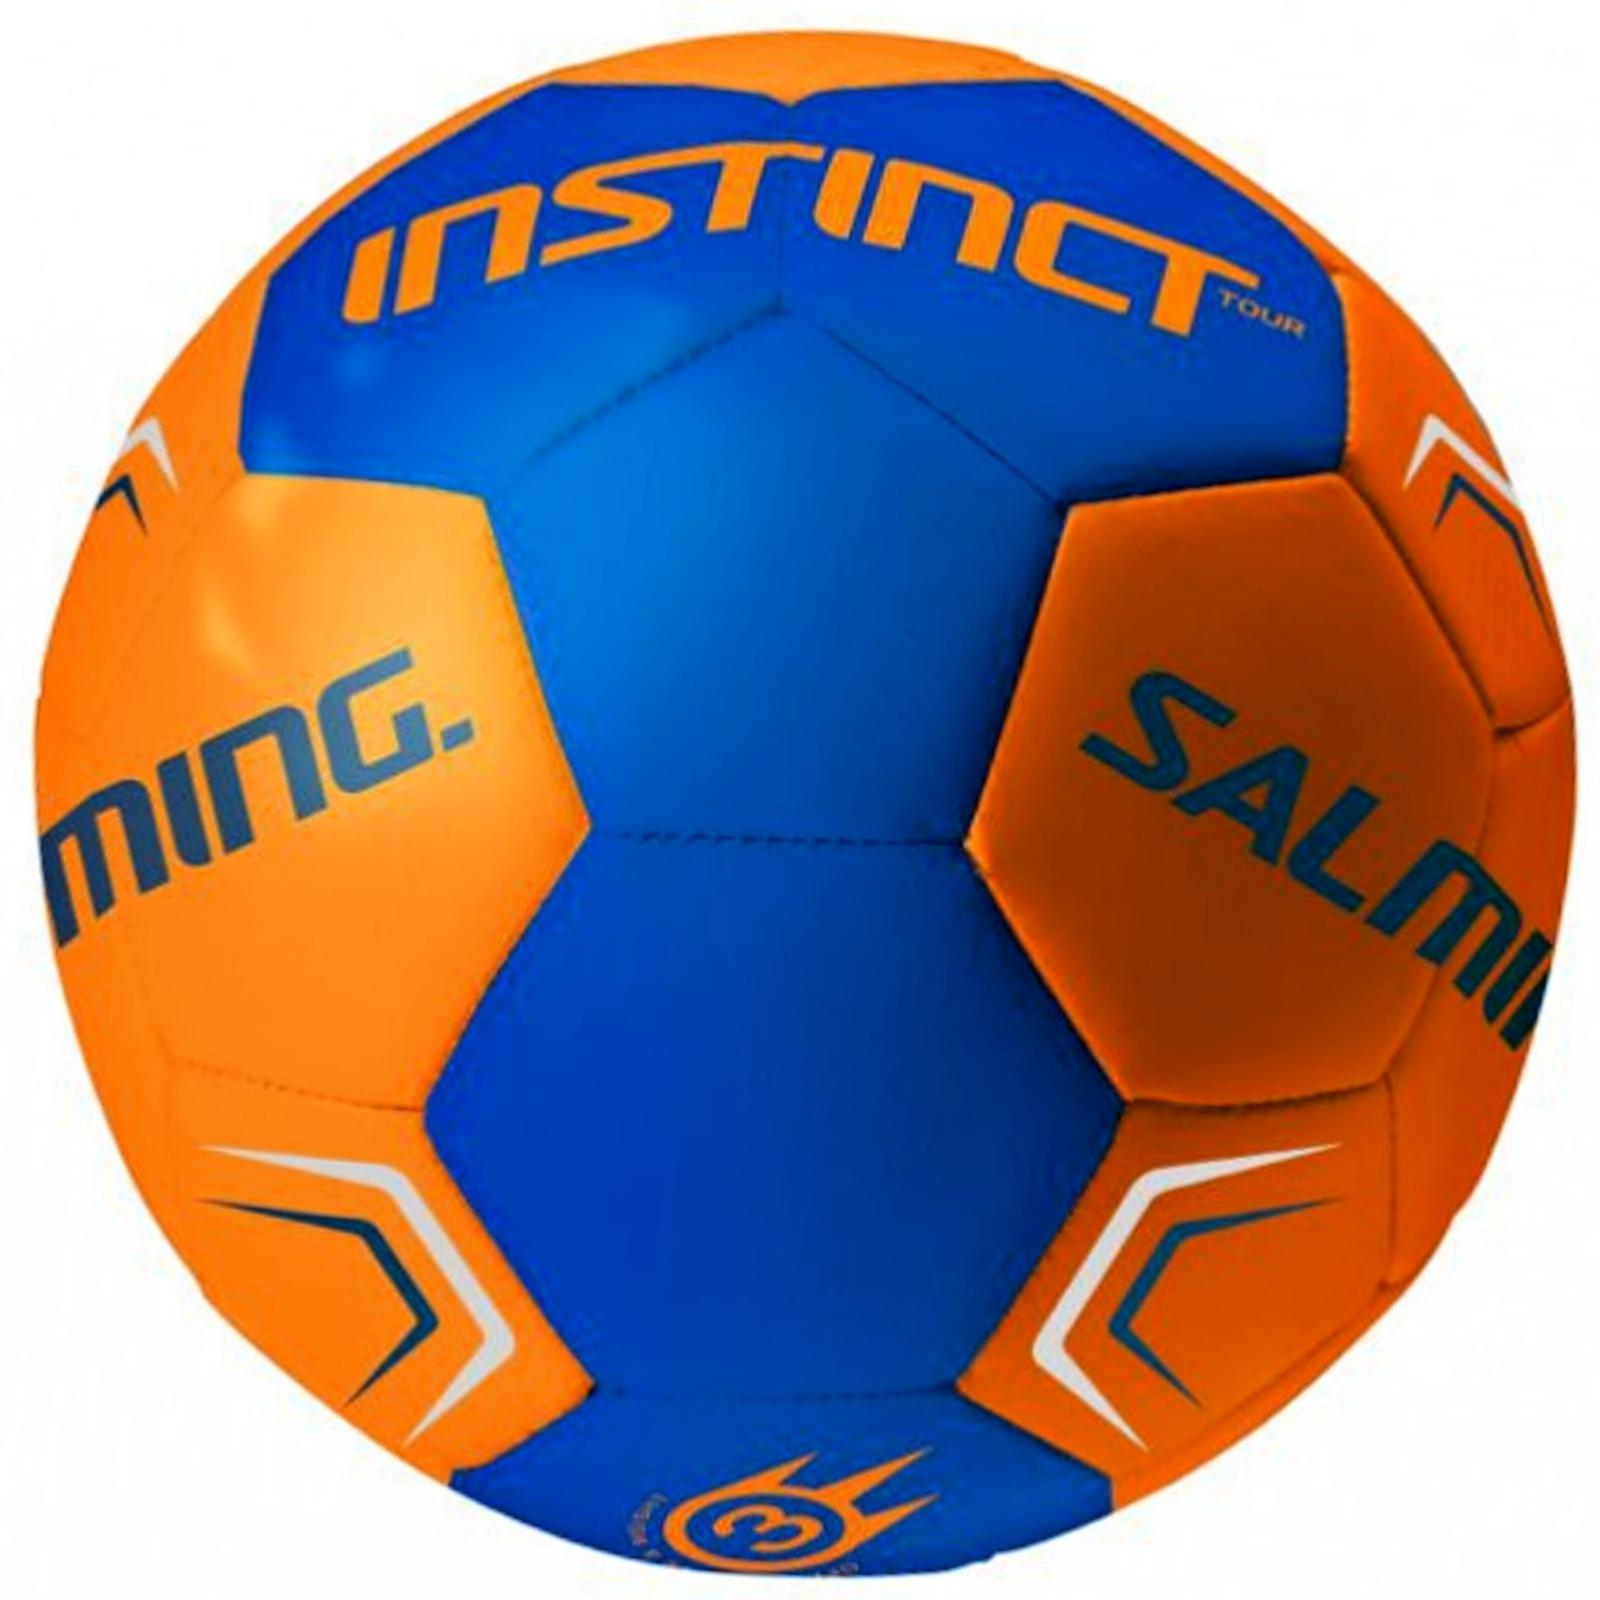 Míč házená SALMING Instinct Tour Handball 3, oranžovo-modrý